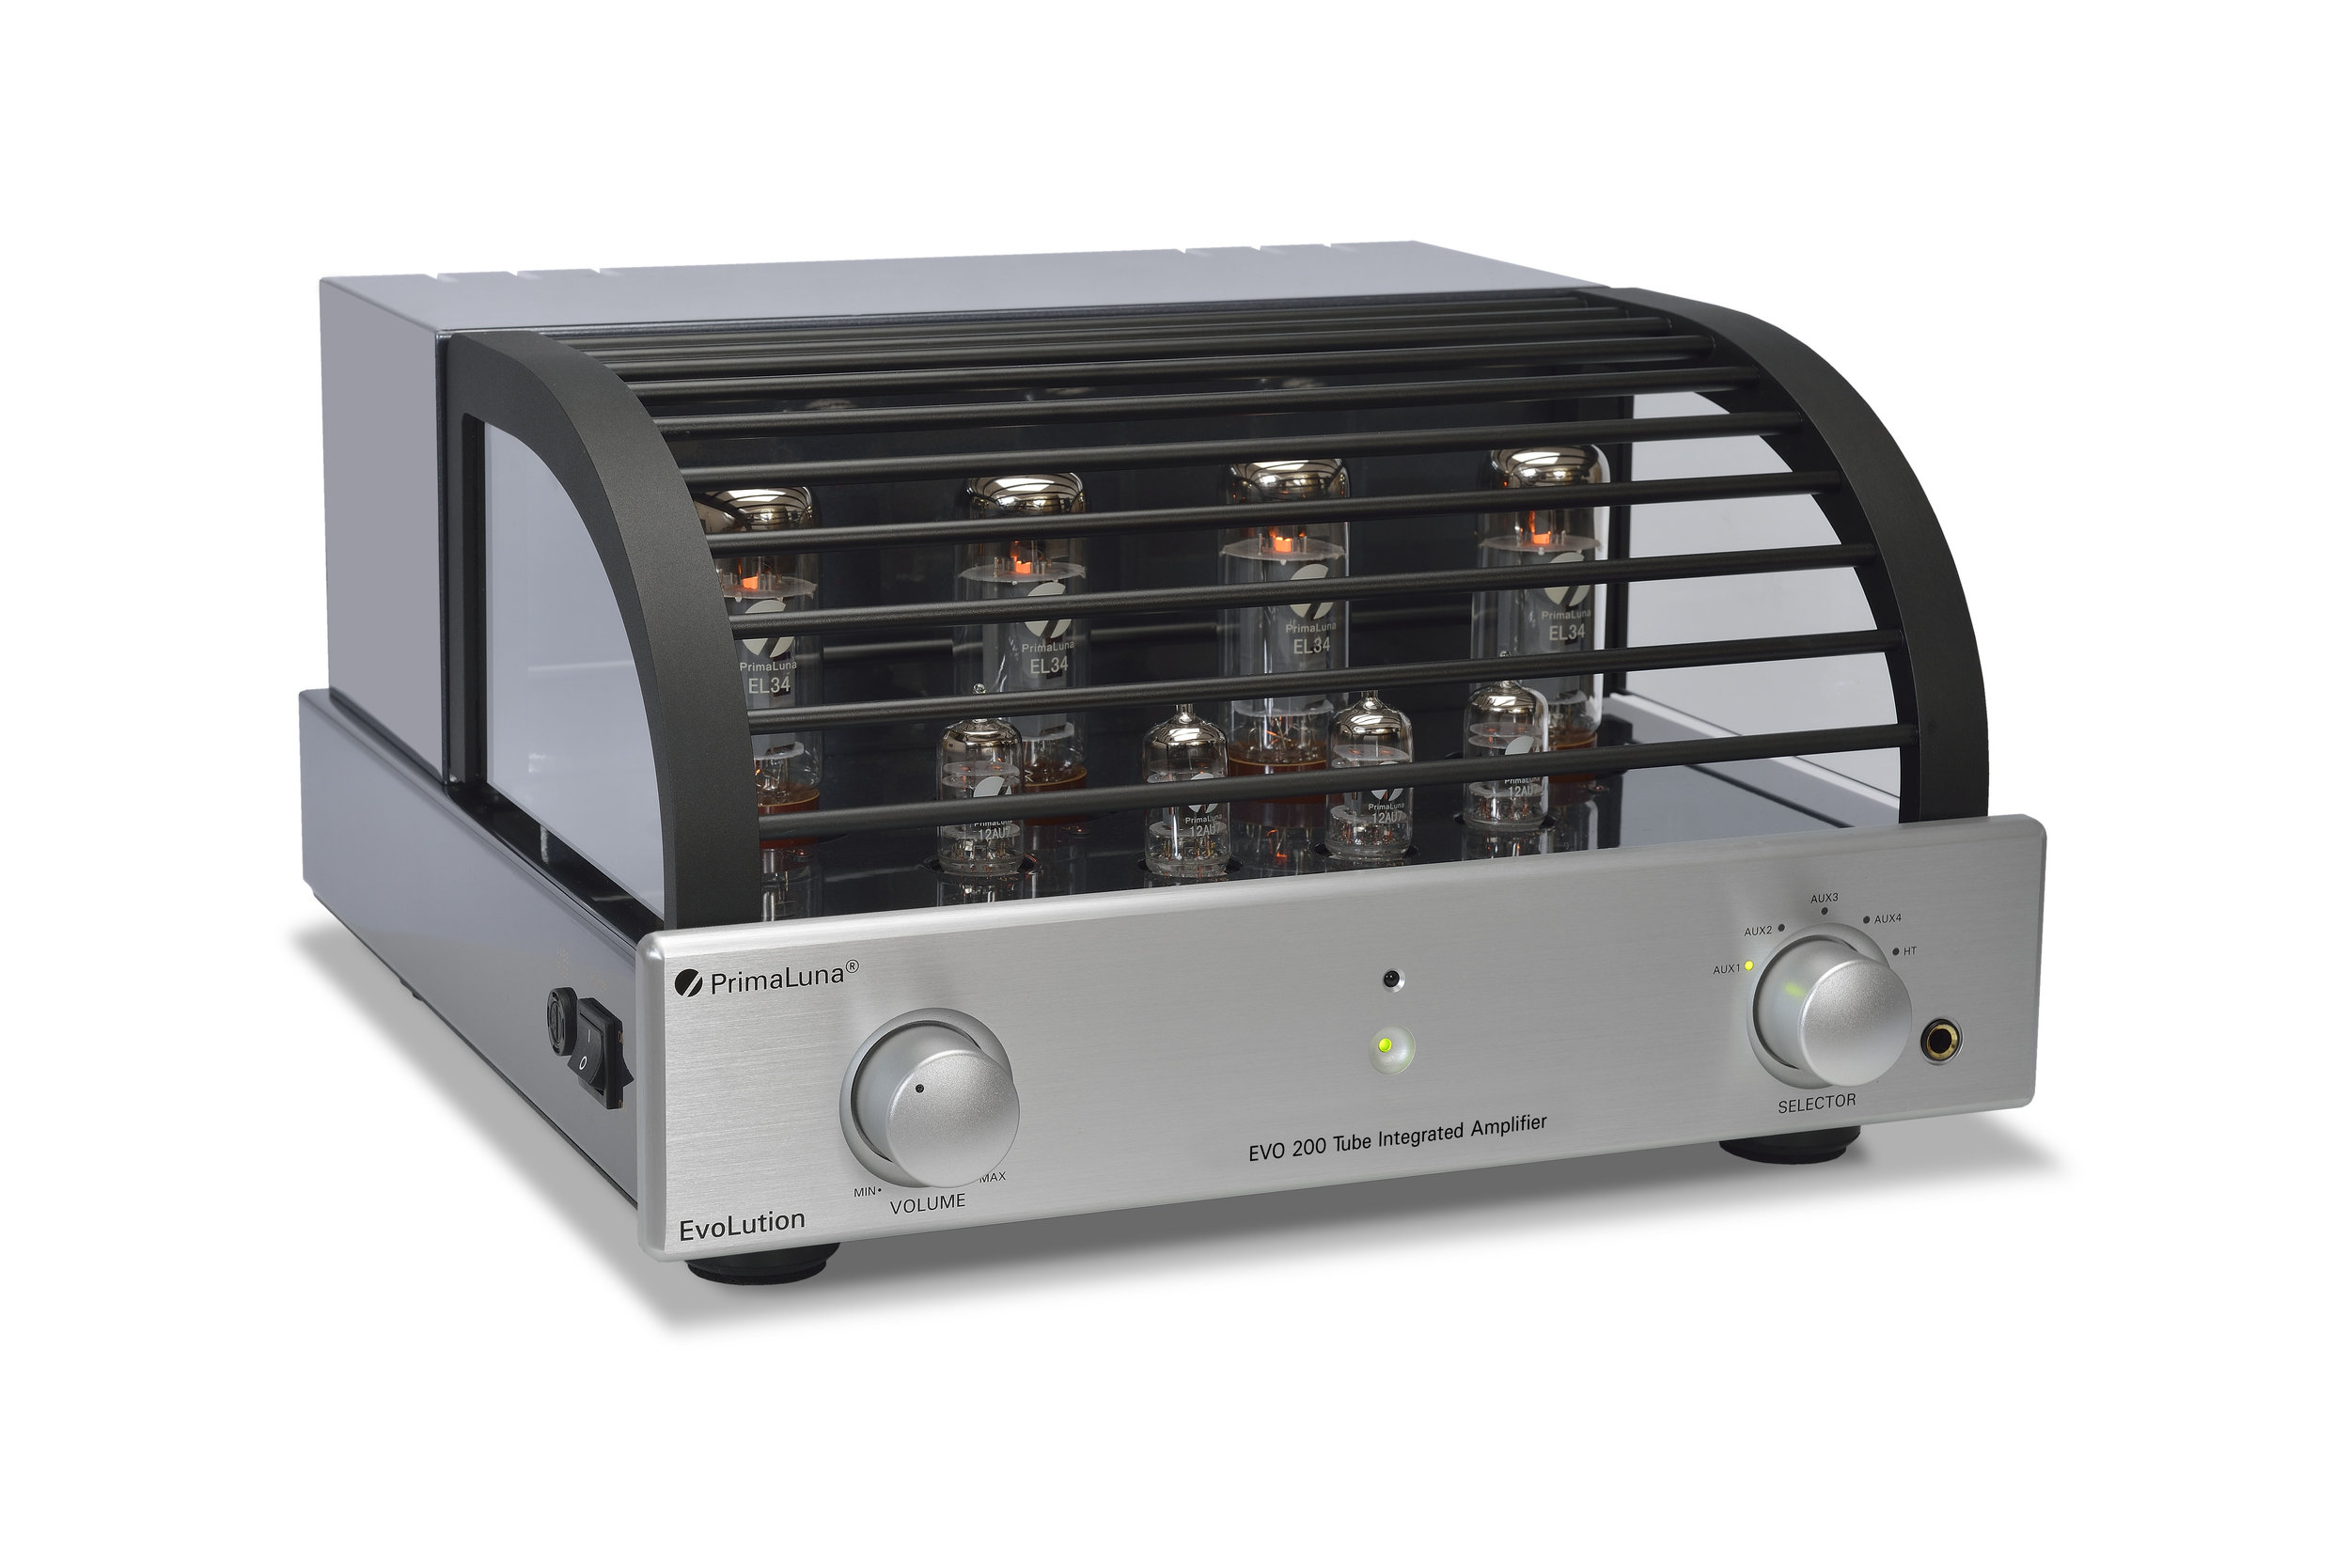 103b - PrimaLuna Evo 200 Tube Integrated Amplifier - silver - slanted - white background.jpg